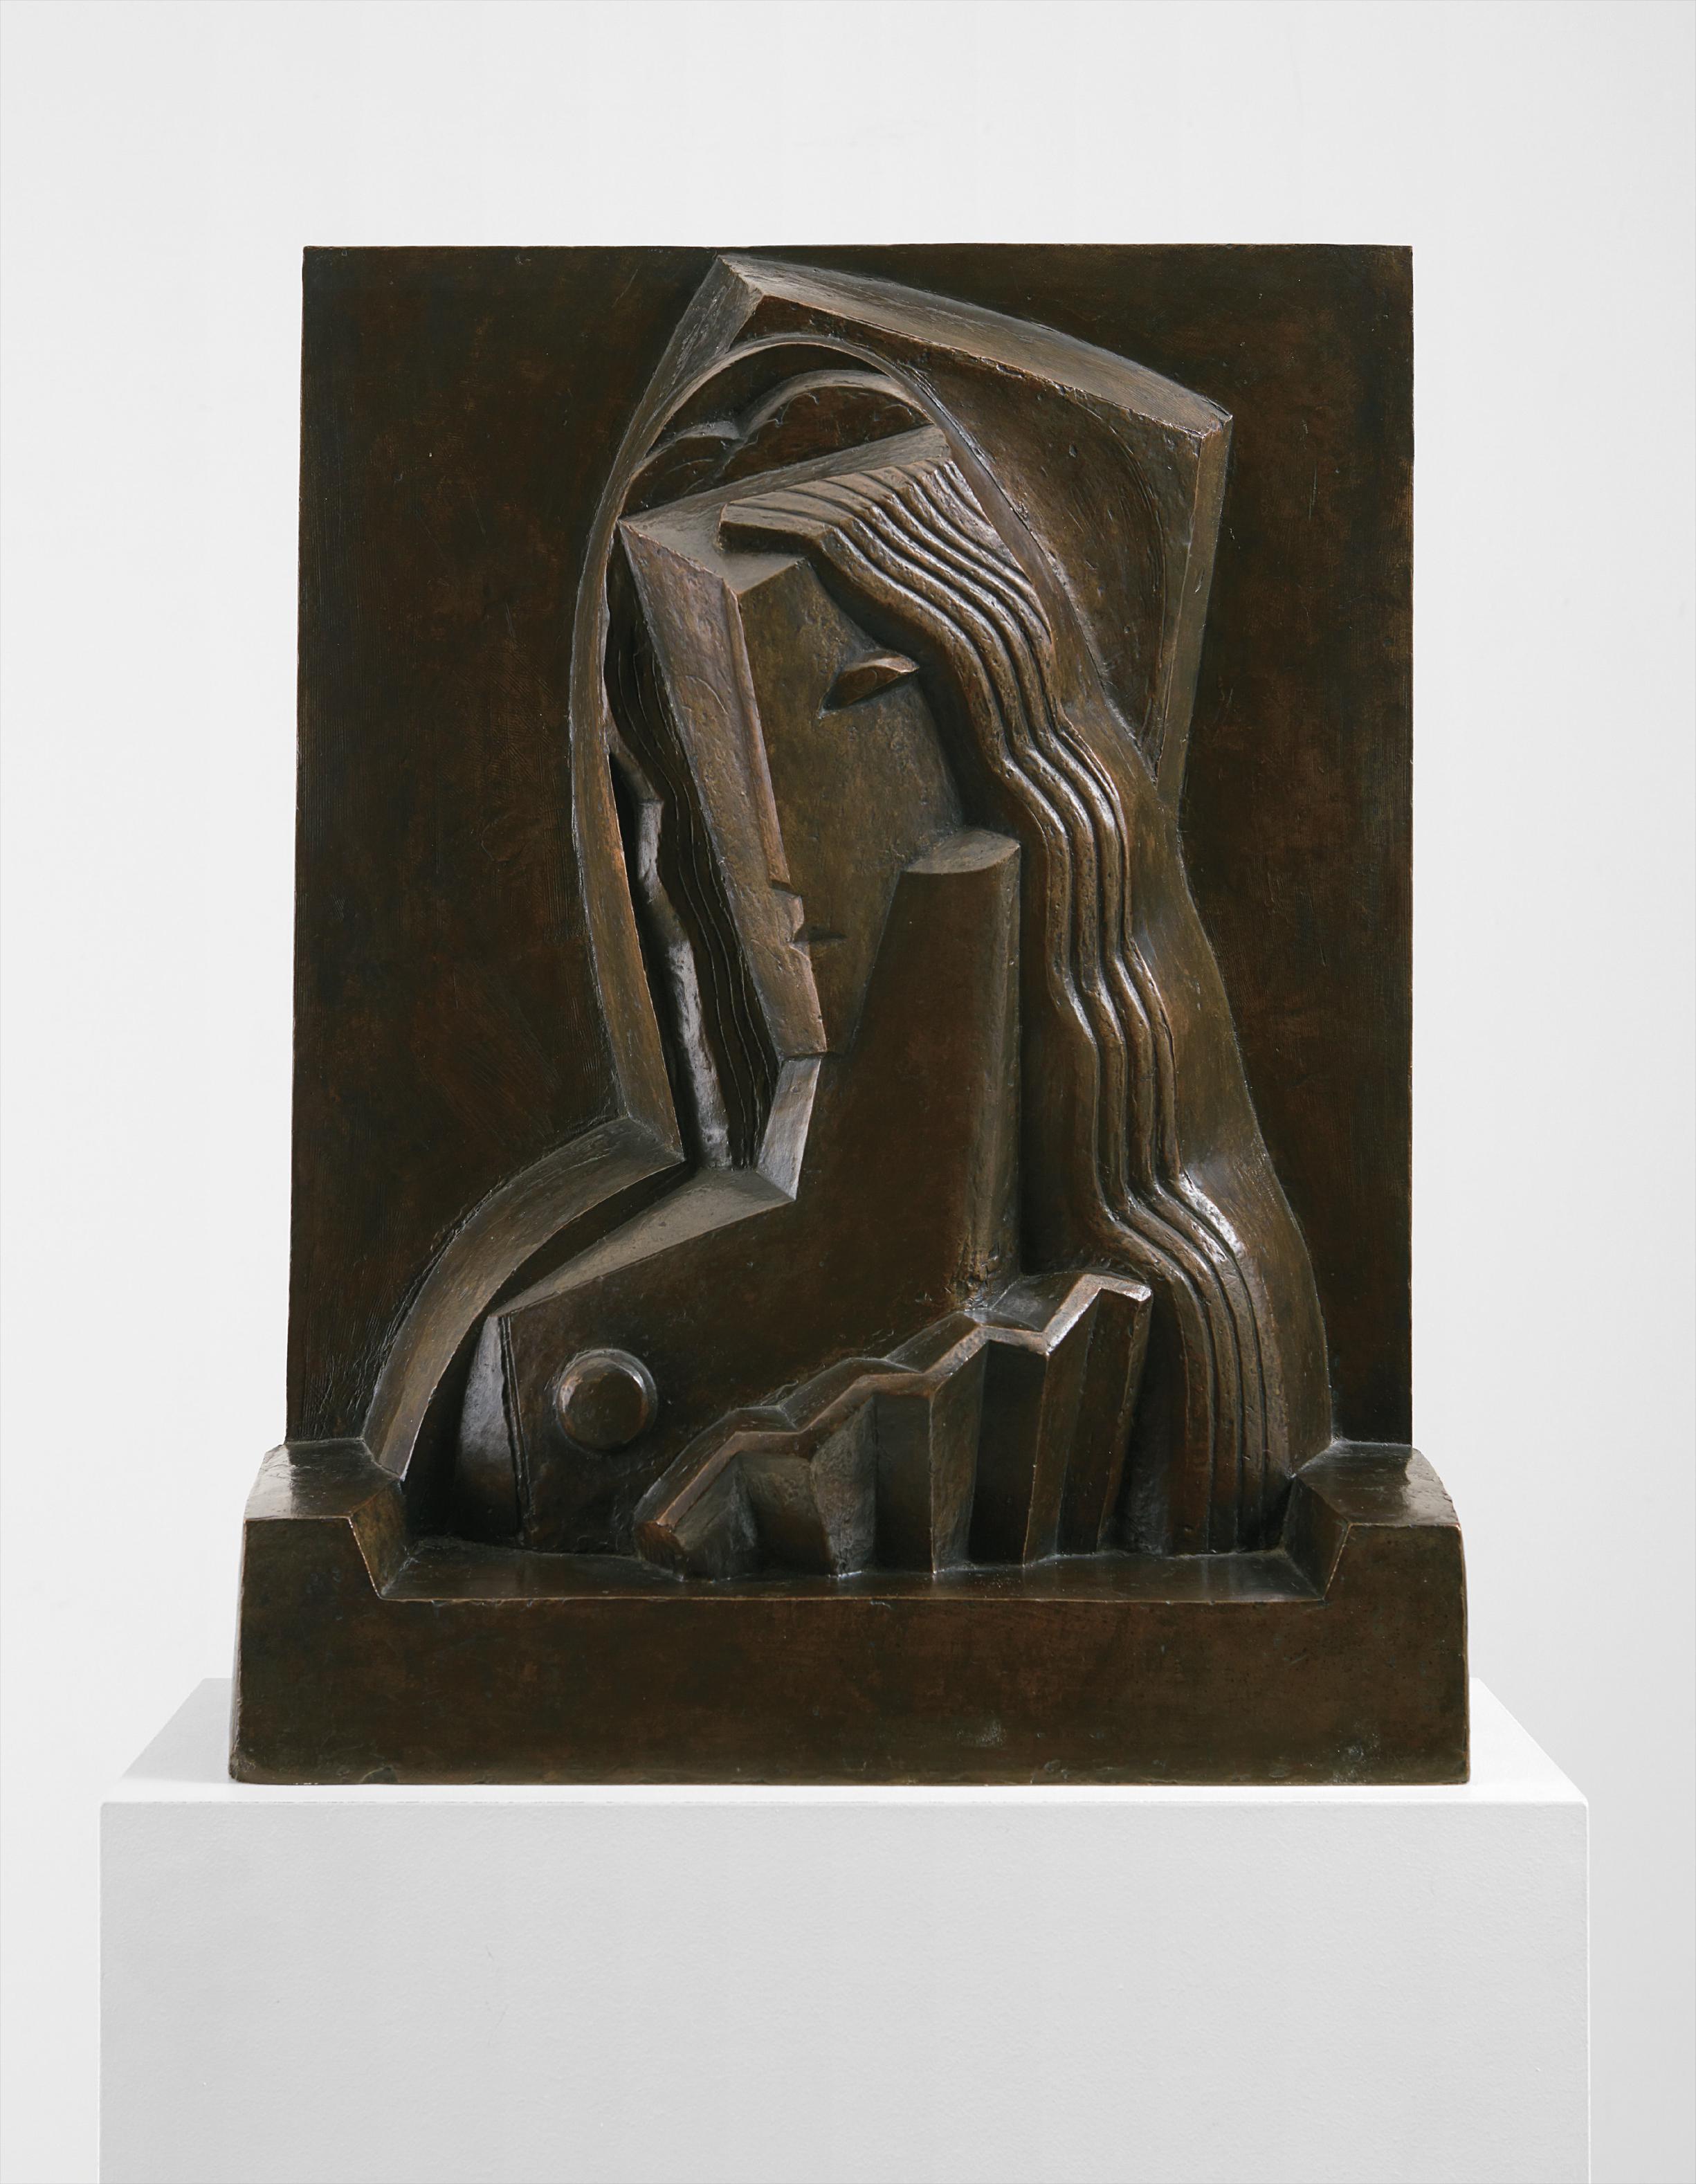 Henri Laurens-Femme A Leventail (Woman With Fan)-1921